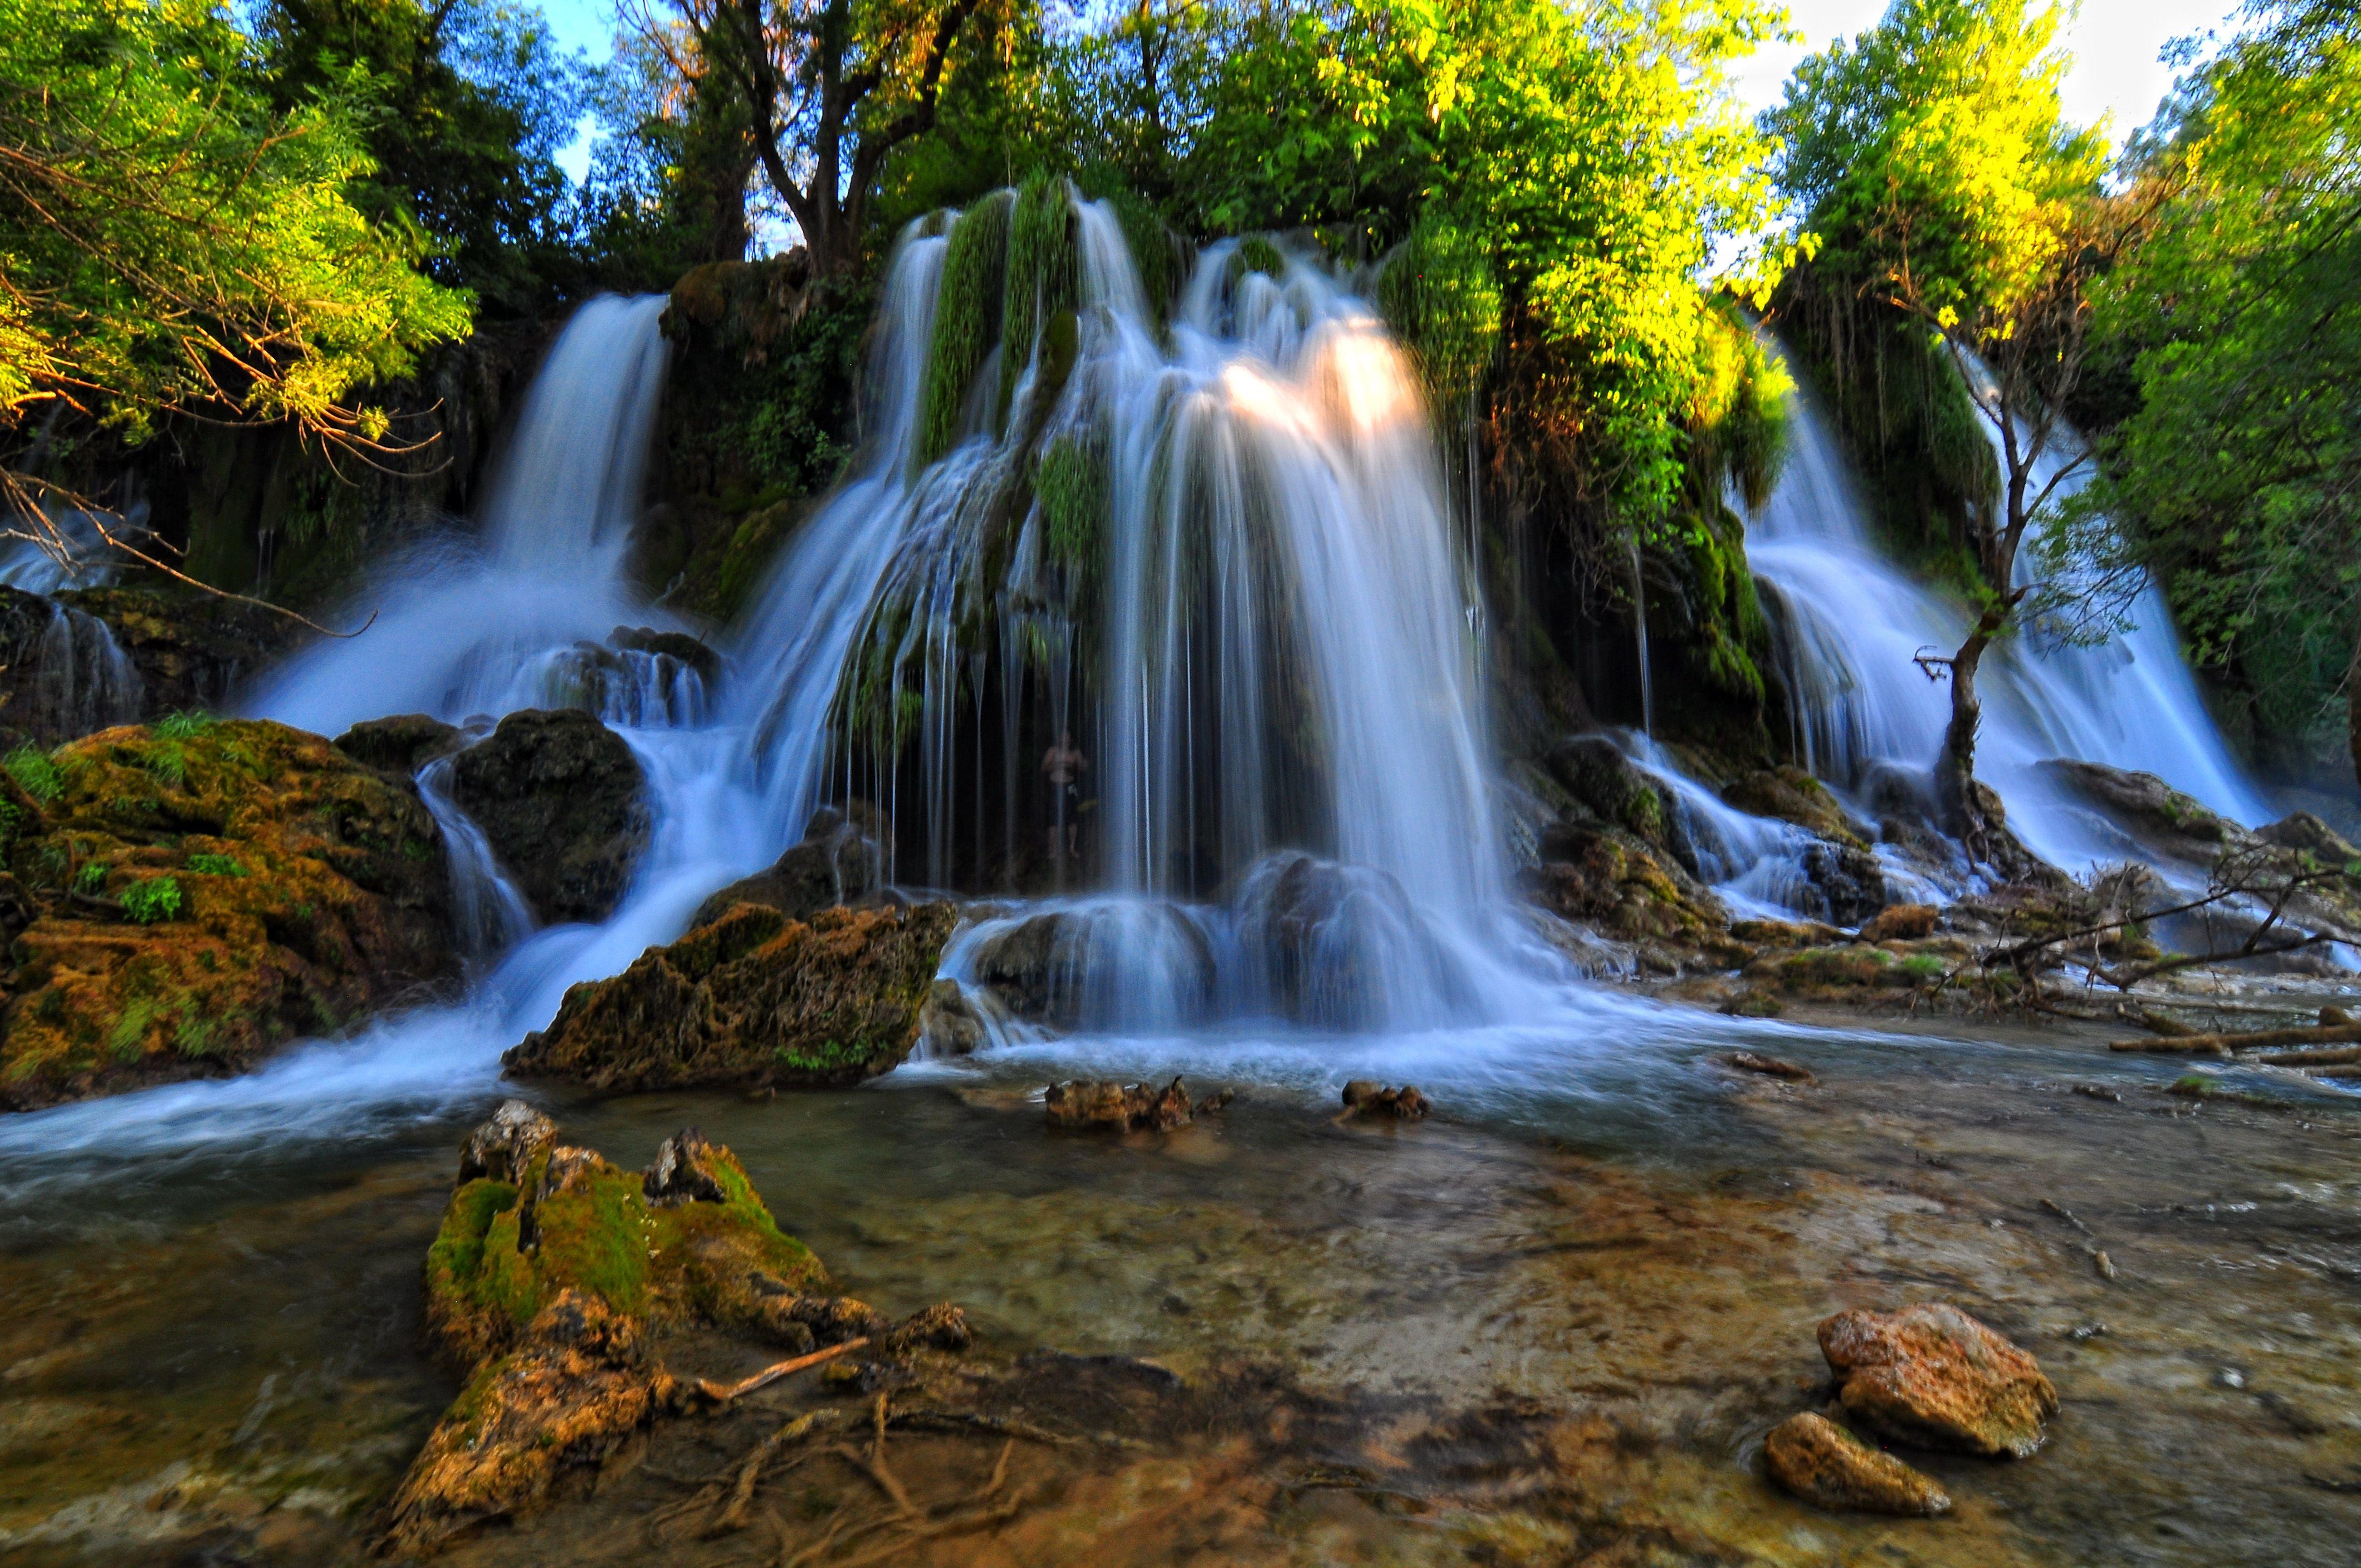 Niagara Falls At Night Wallpaper Kravice Waterfall On The Trebižat River In Bosnia And